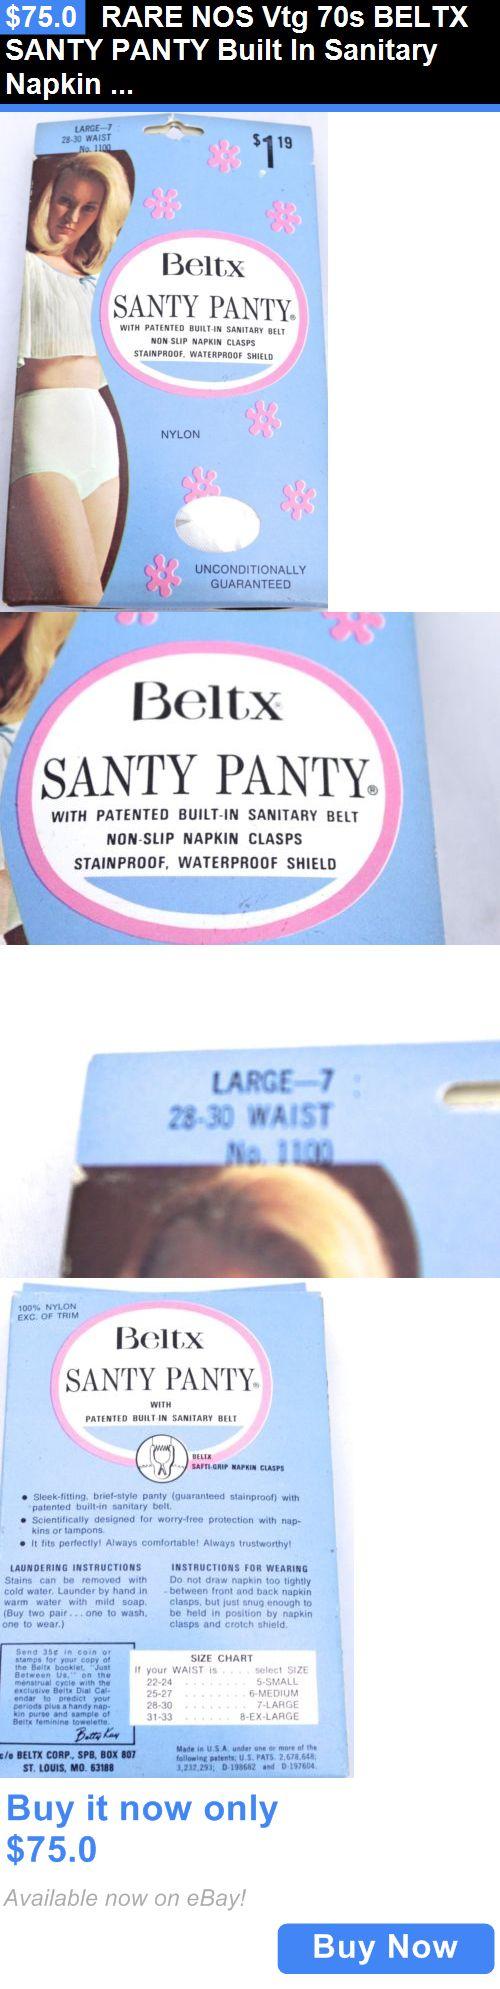 Sanitary Napkins: Rare Nos Vtg 70S Beltx Santy Panty Built In Sanitary Napkin Belt Panties L 28-30 BUY IT NOW ONLY: $75.0